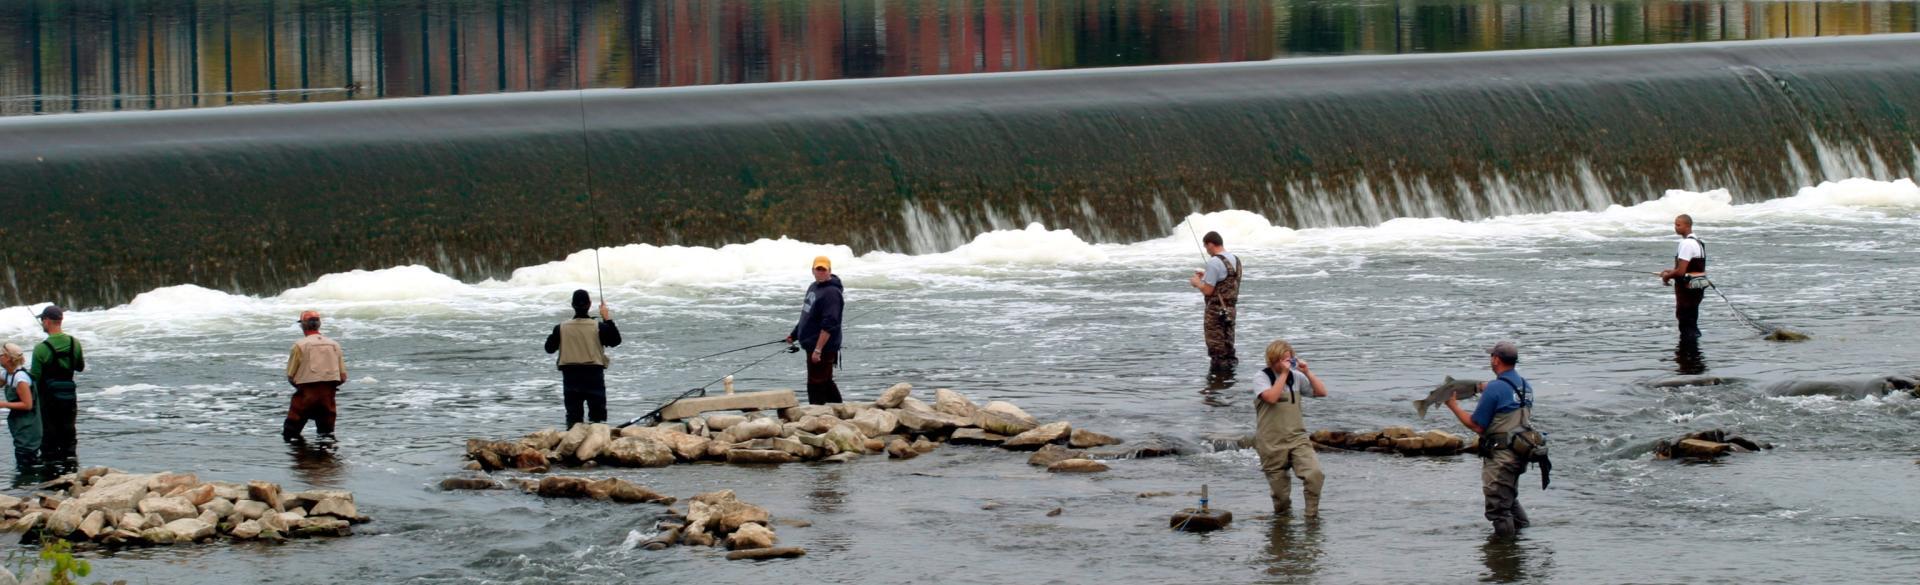 Fishing along the Grand River at the Sixth Street Dam.